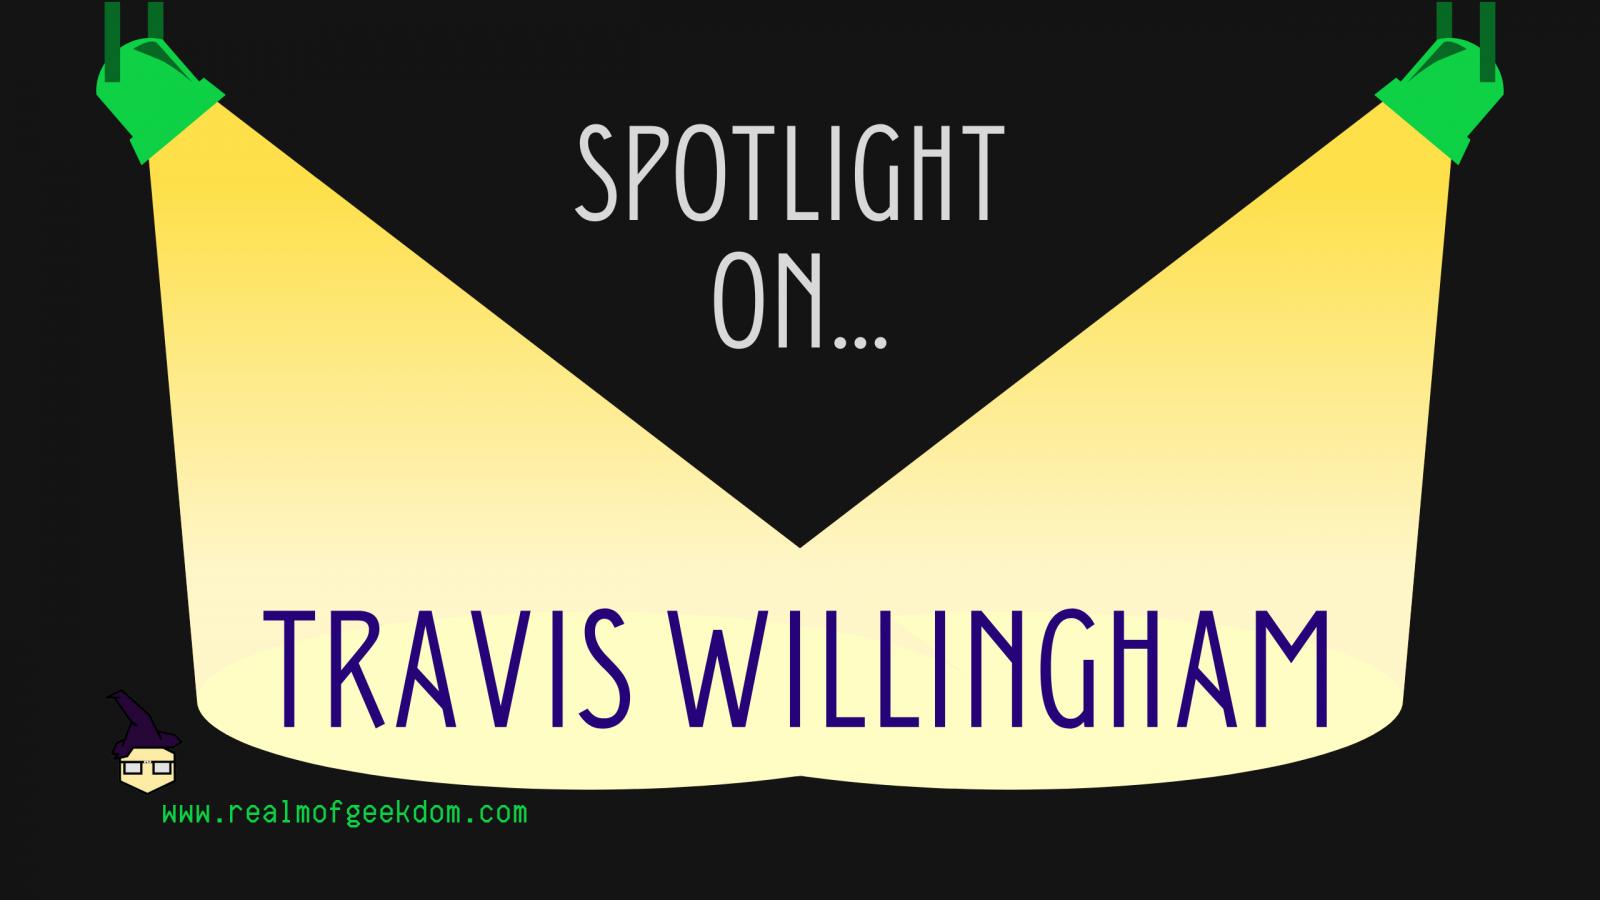 Spotlight on Travis Willingham header image